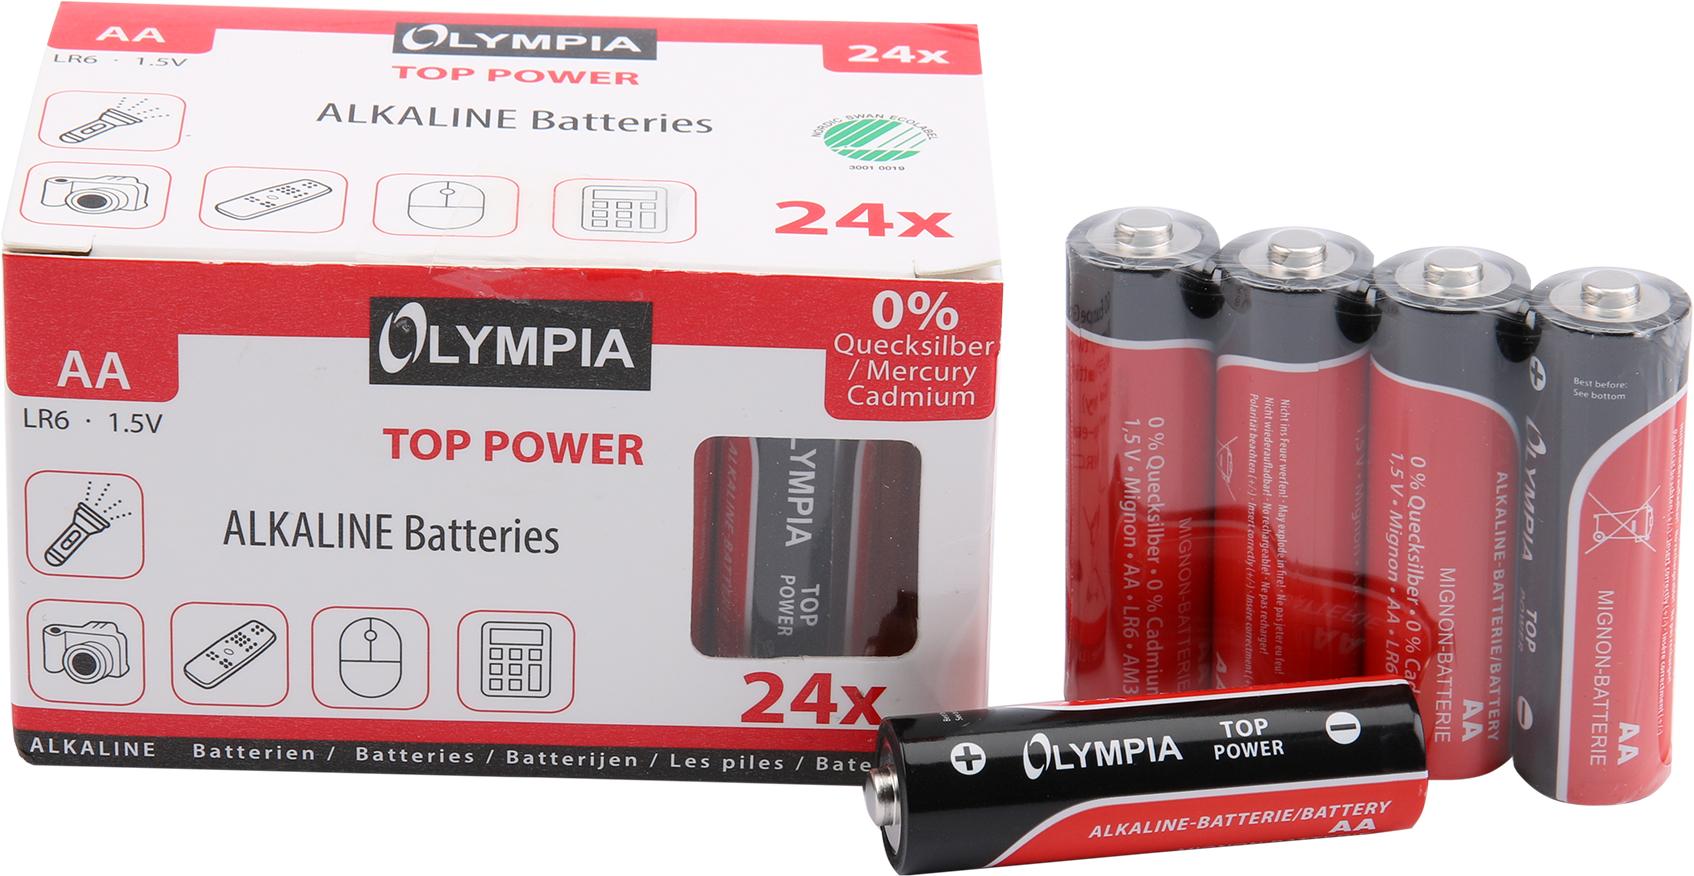 Olympia Alkaline Batterien AA 24er Pack - Batterie - Batterie